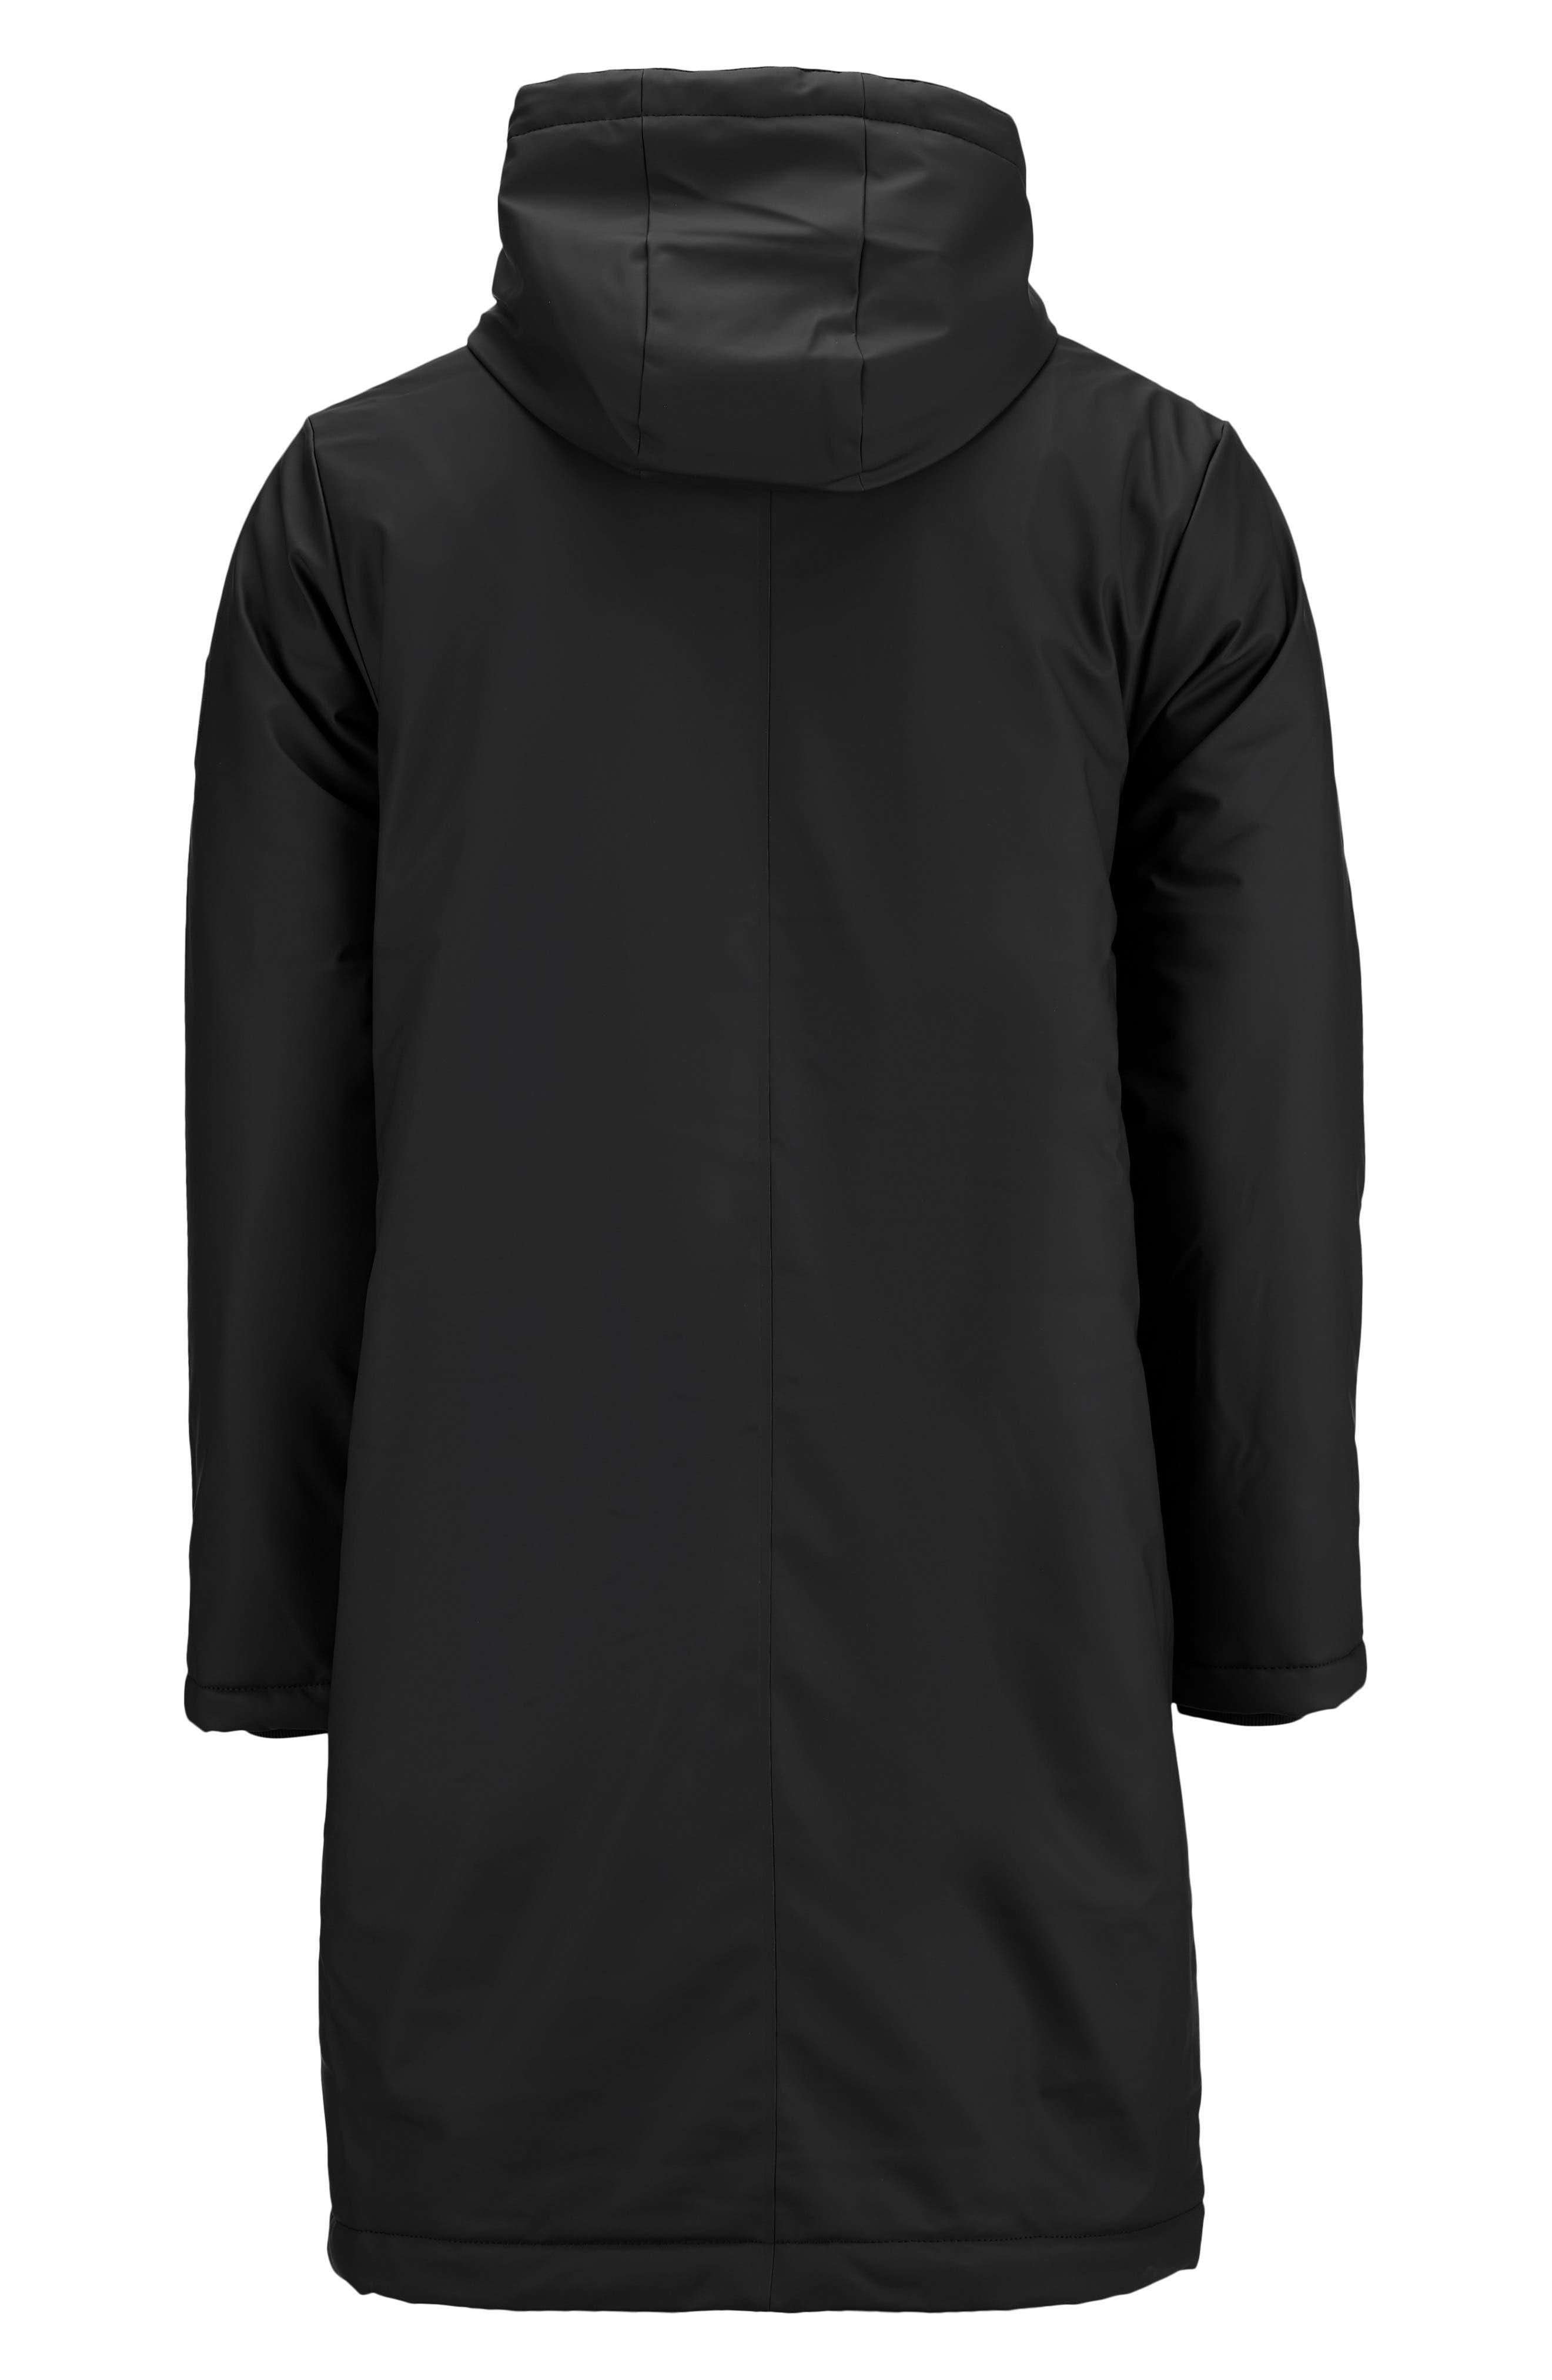 Thermal Hooded Raincoat,                             Alternate thumbnail 7, color,                             BLACK